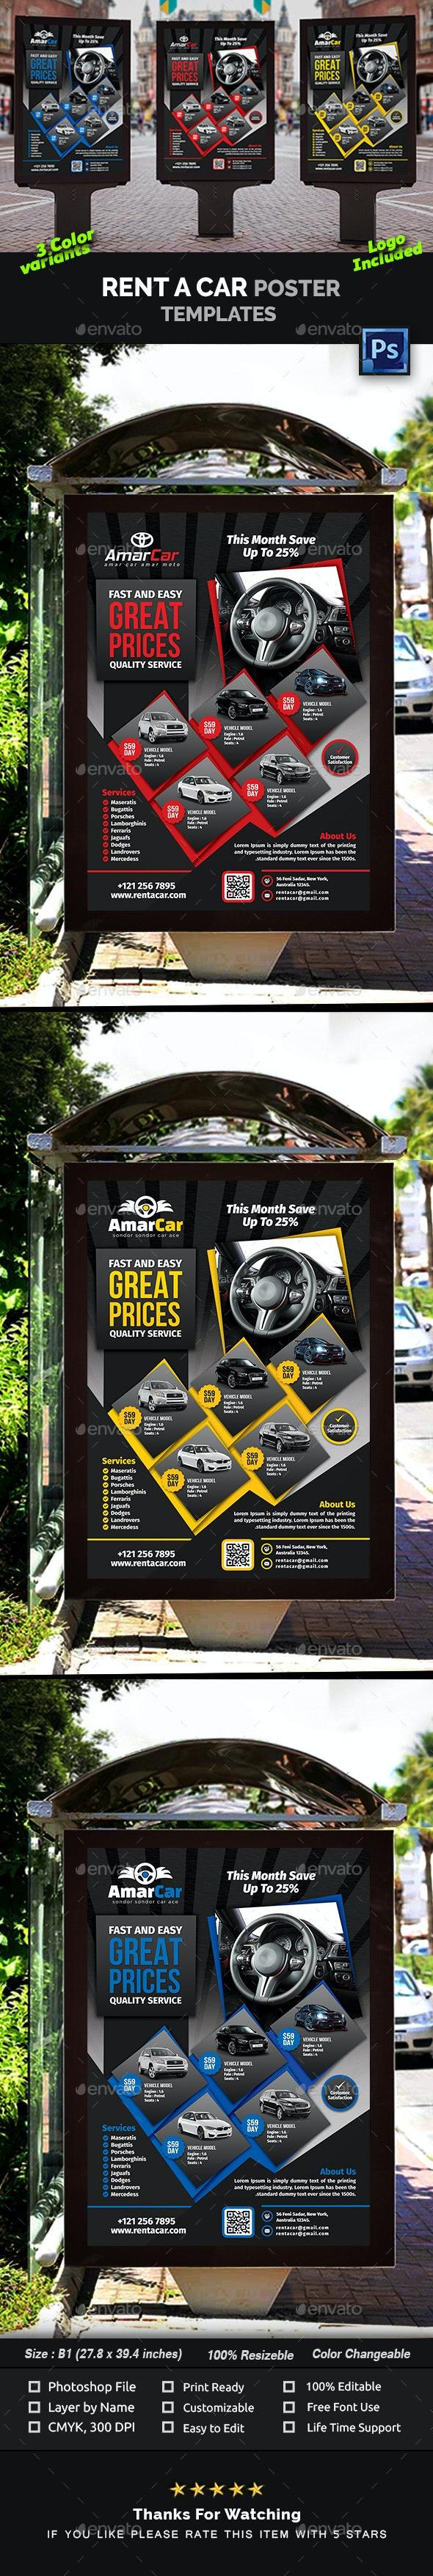 Rent a Car Poster Templates - Signage Print Templates